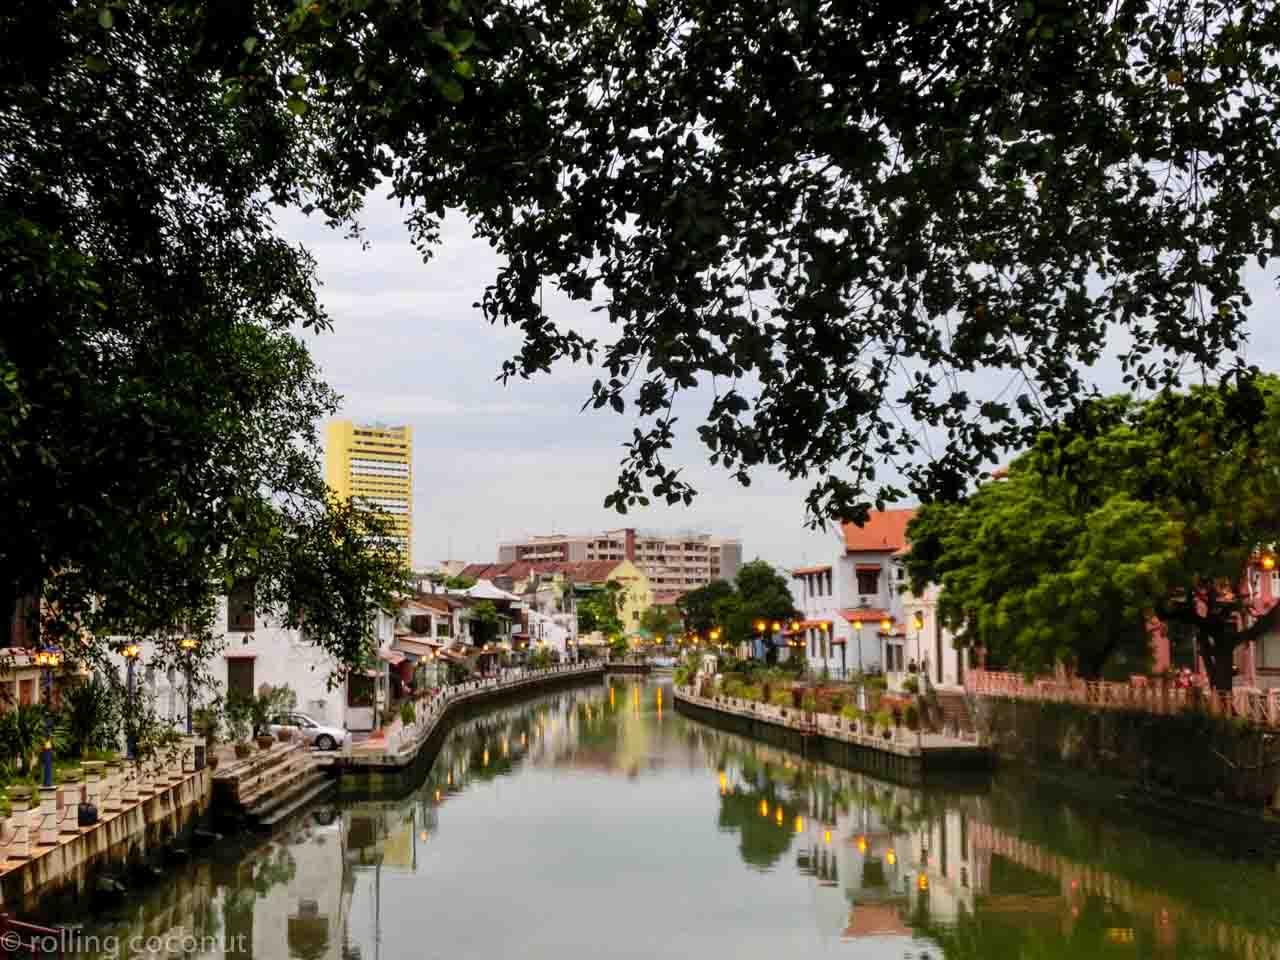 Canal view in Melaka